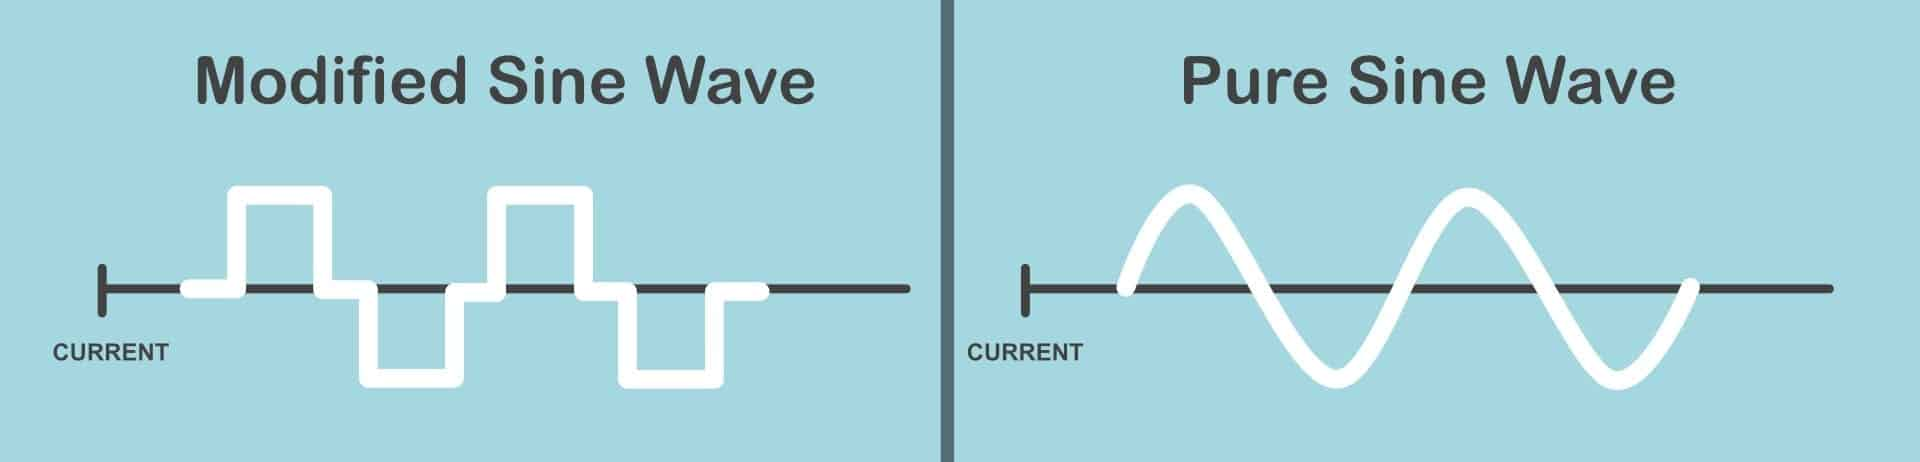 Image showing modified sine wave vs pure sine wave power curves